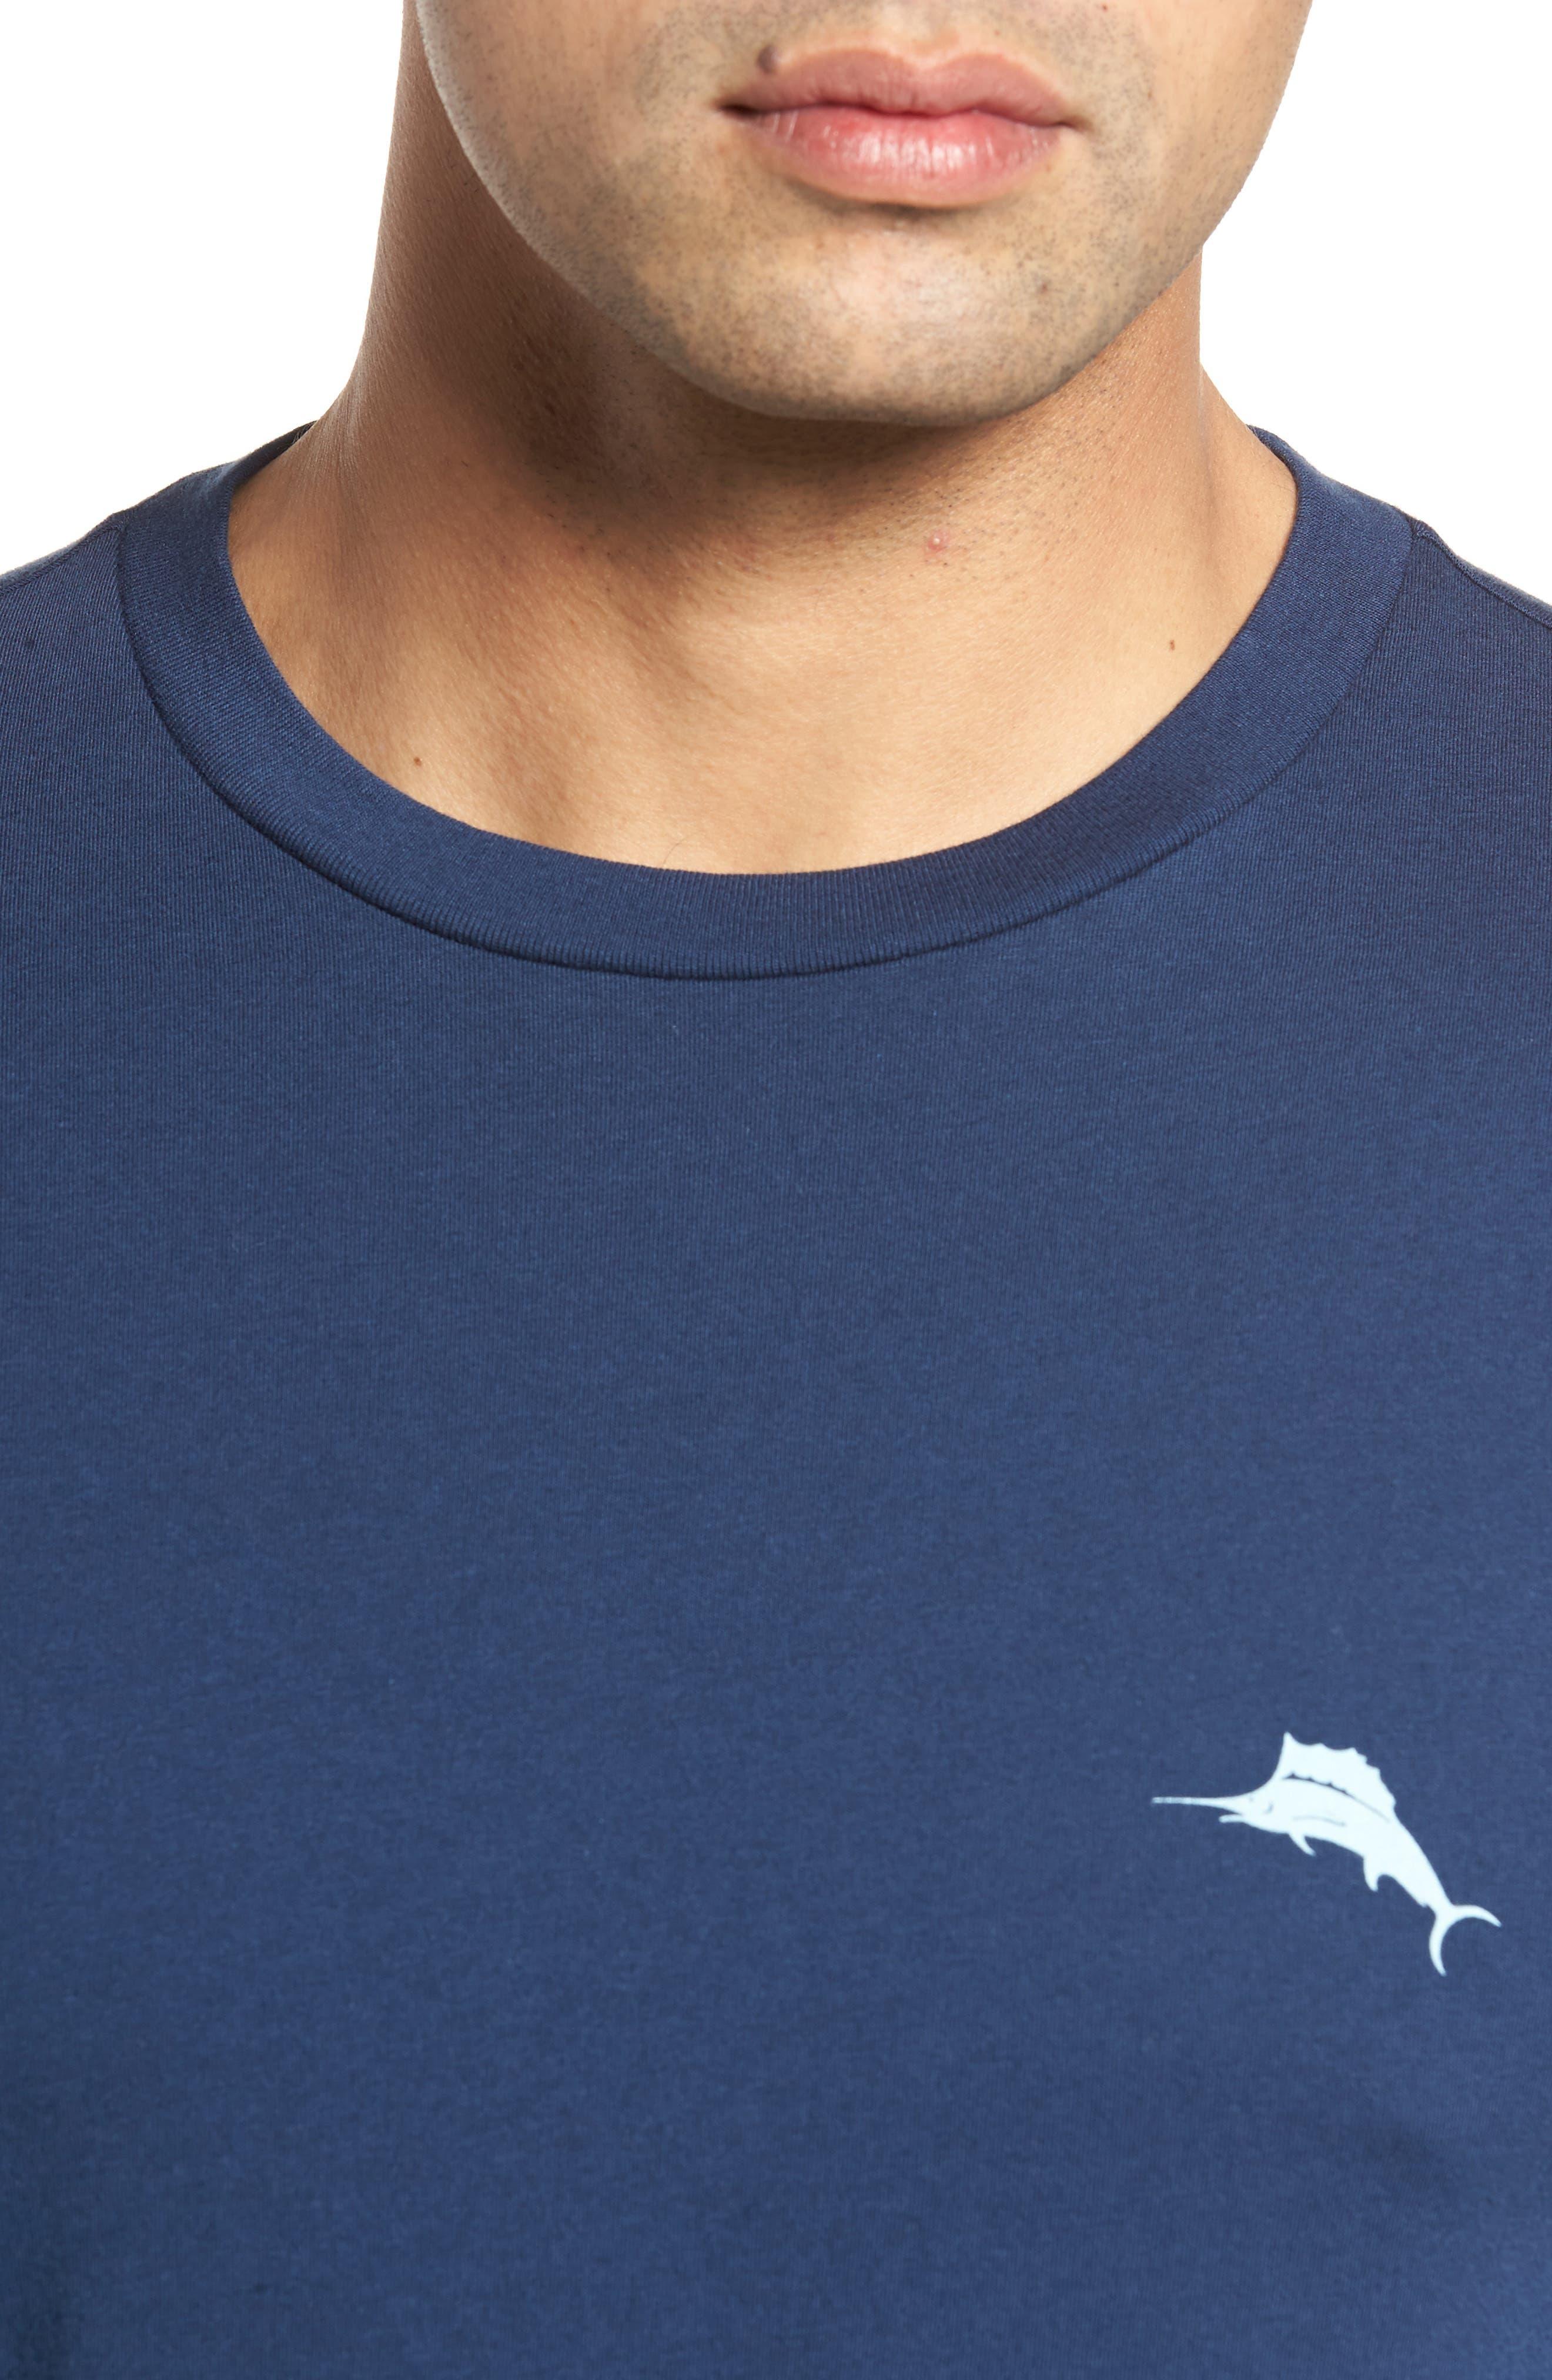 Diamond Isle Graphic T-Shirt,                             Alternate thumbnail 4, color,                             Navy